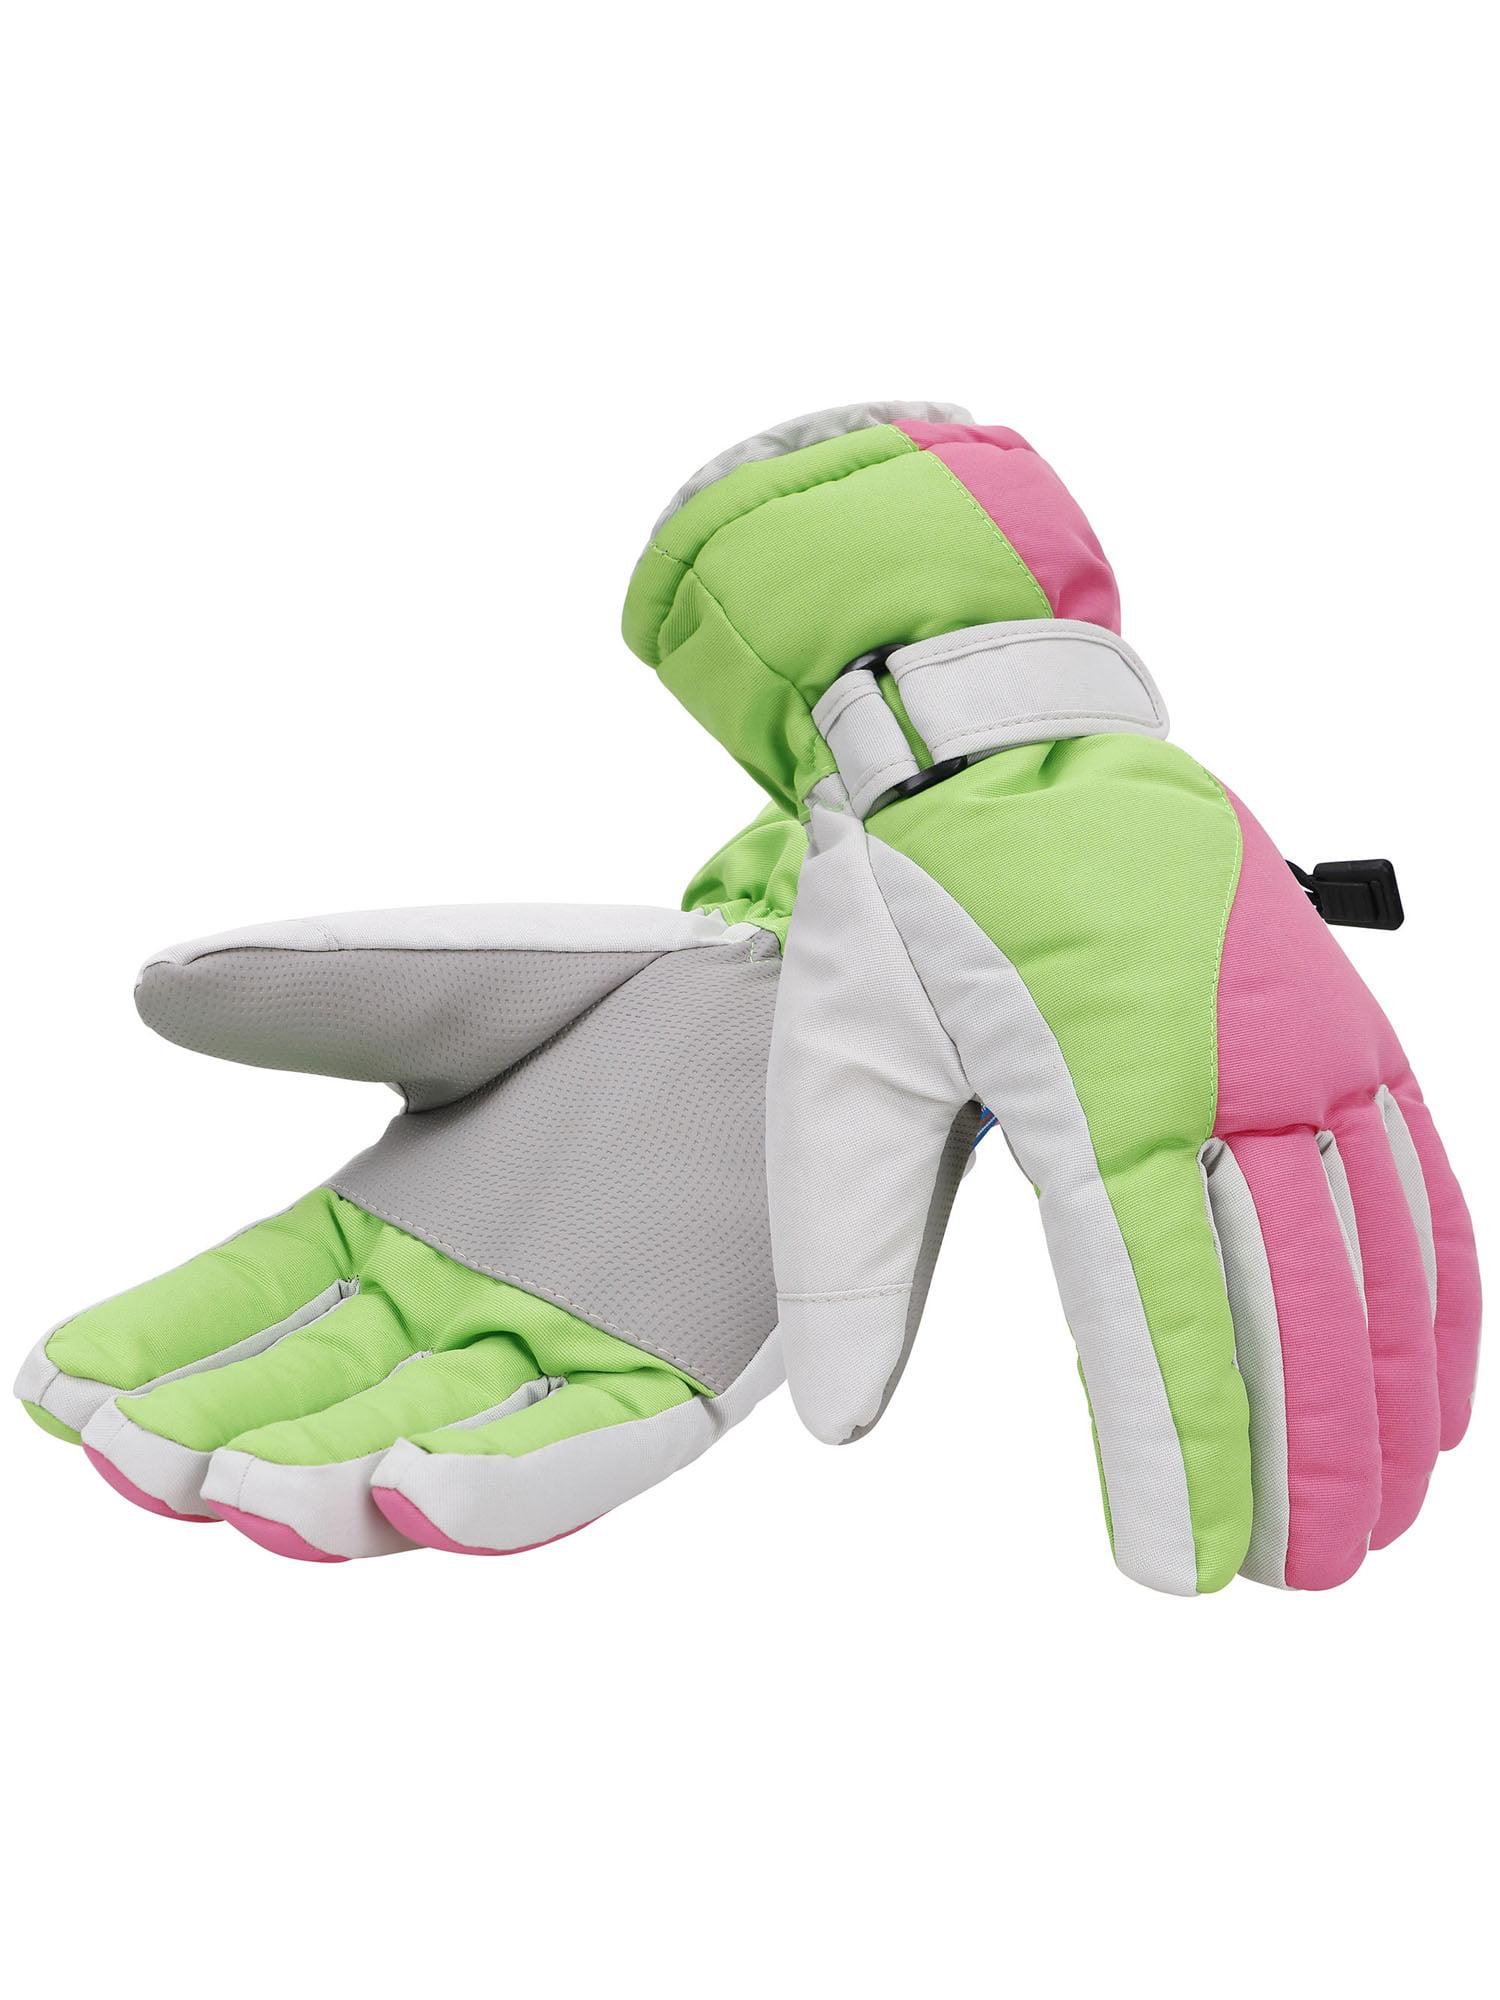 Women's Winter Waterproof Outdoor Snowboard Ski Gloves,L, Pink Green